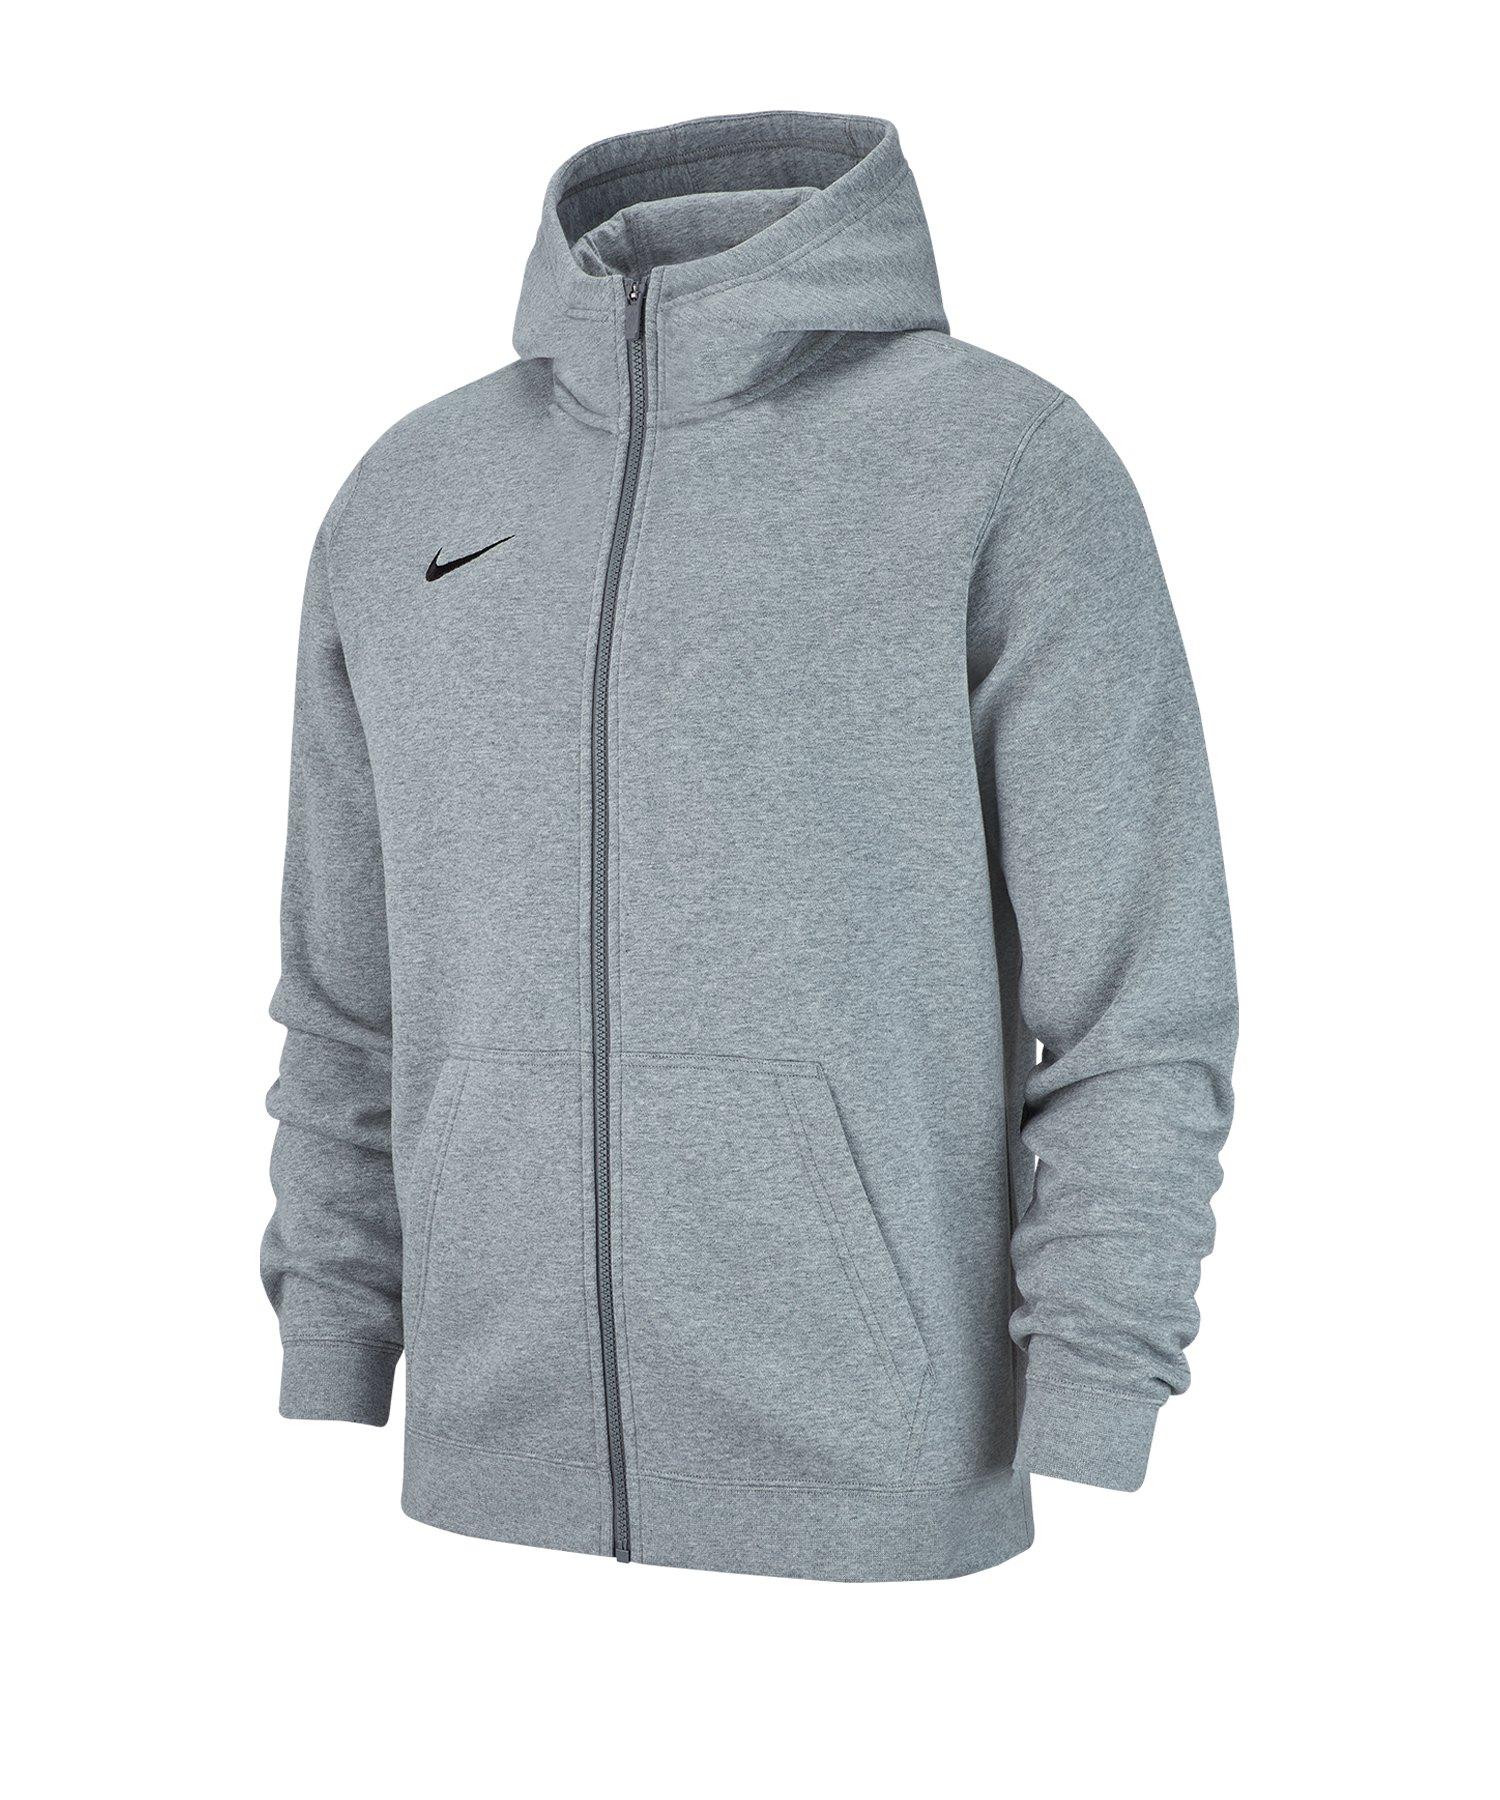 Nike Club 19 Fleece Kapuzenjacke Kids Grau F063 - grau